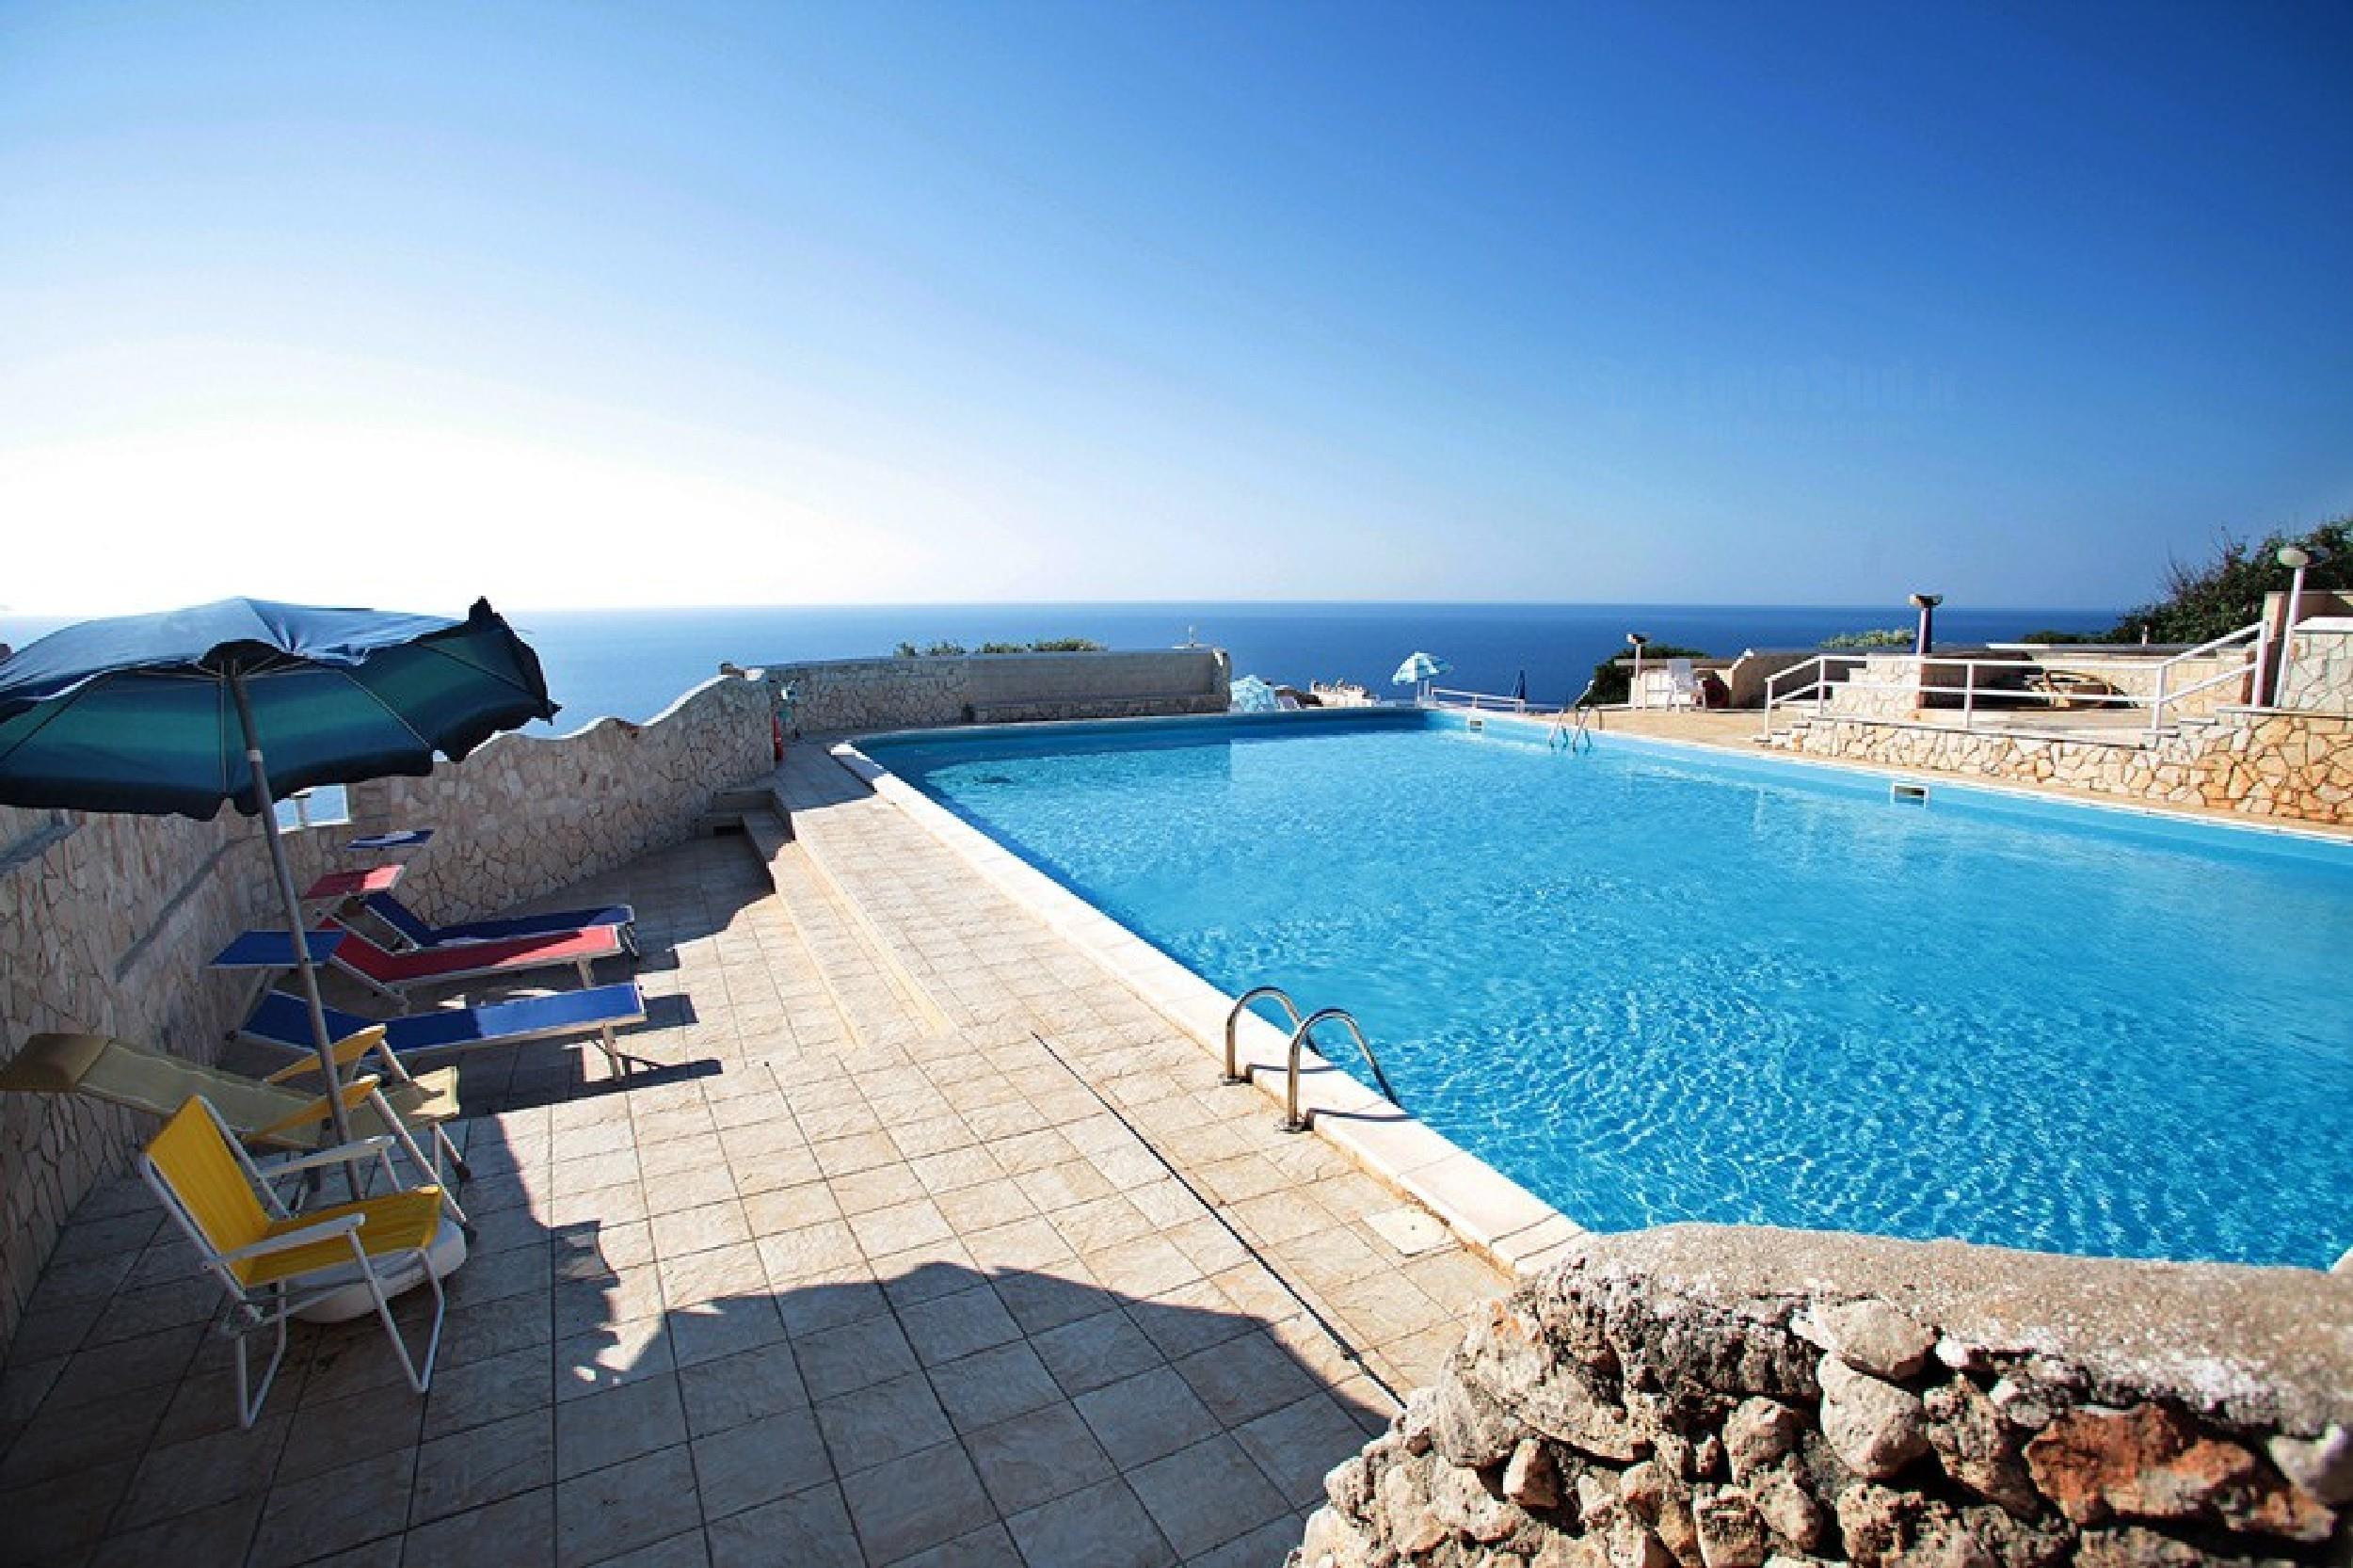 Anna pool residence